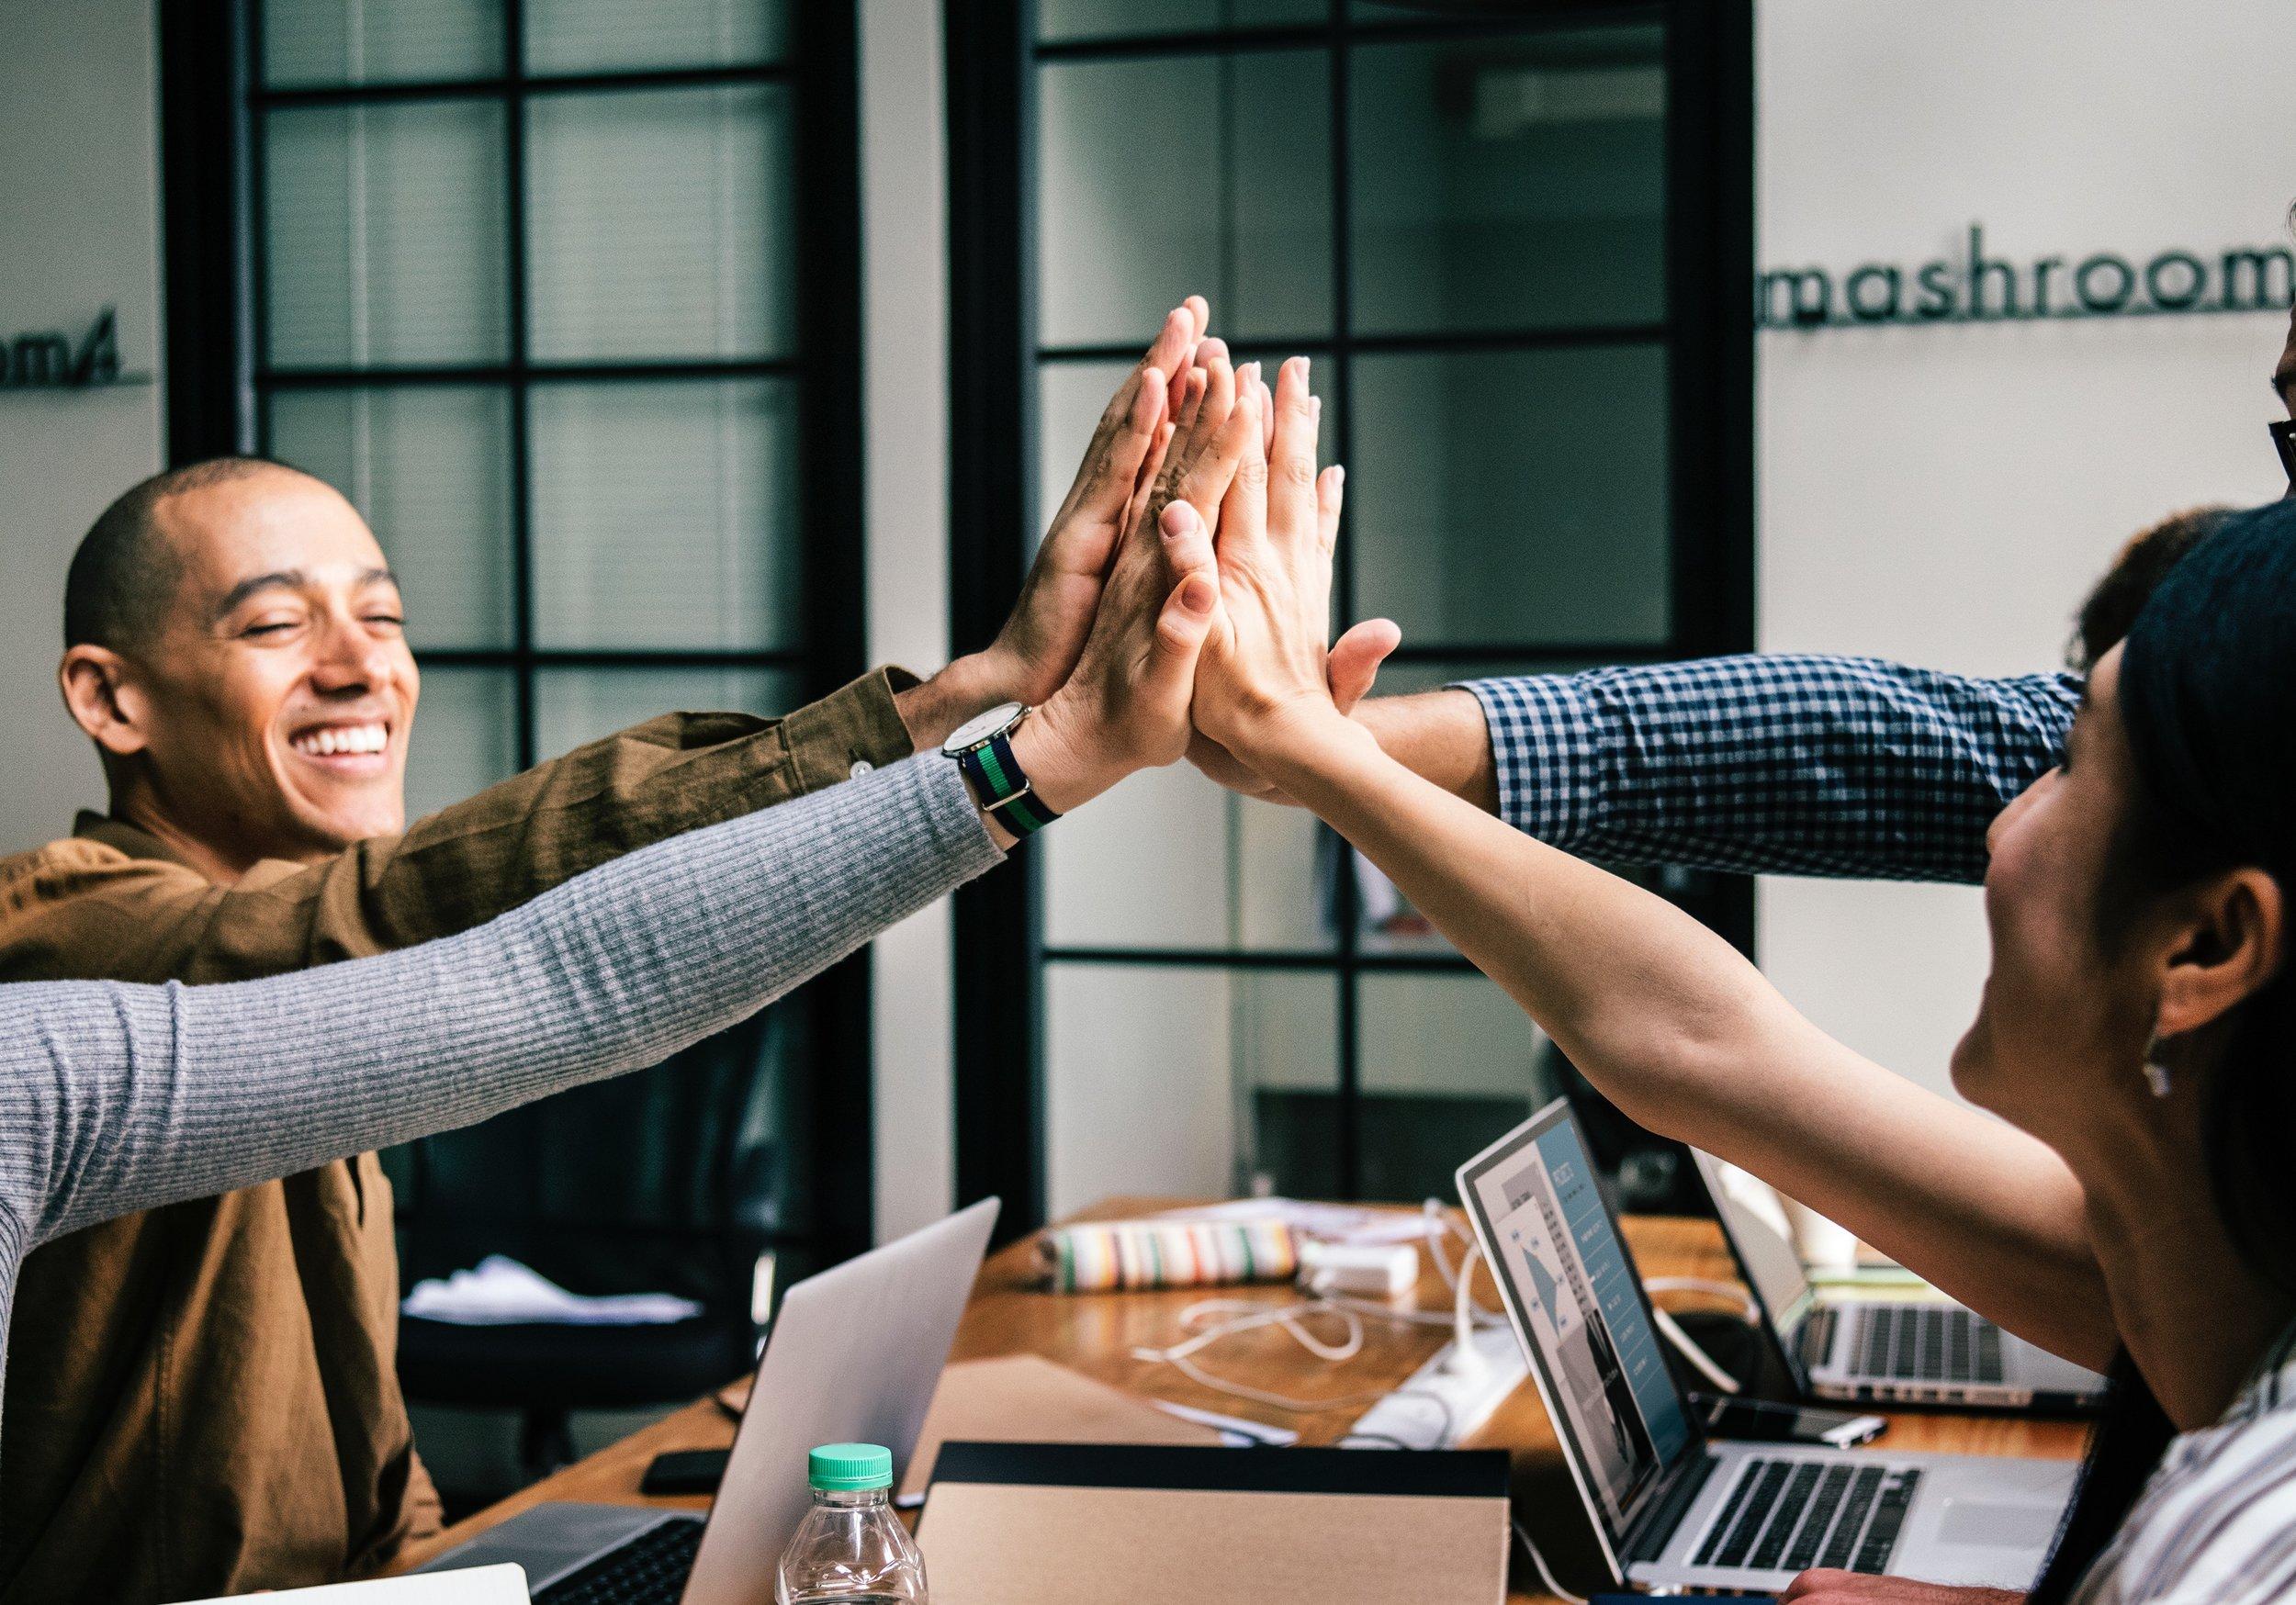 Business meeting handshake across the table